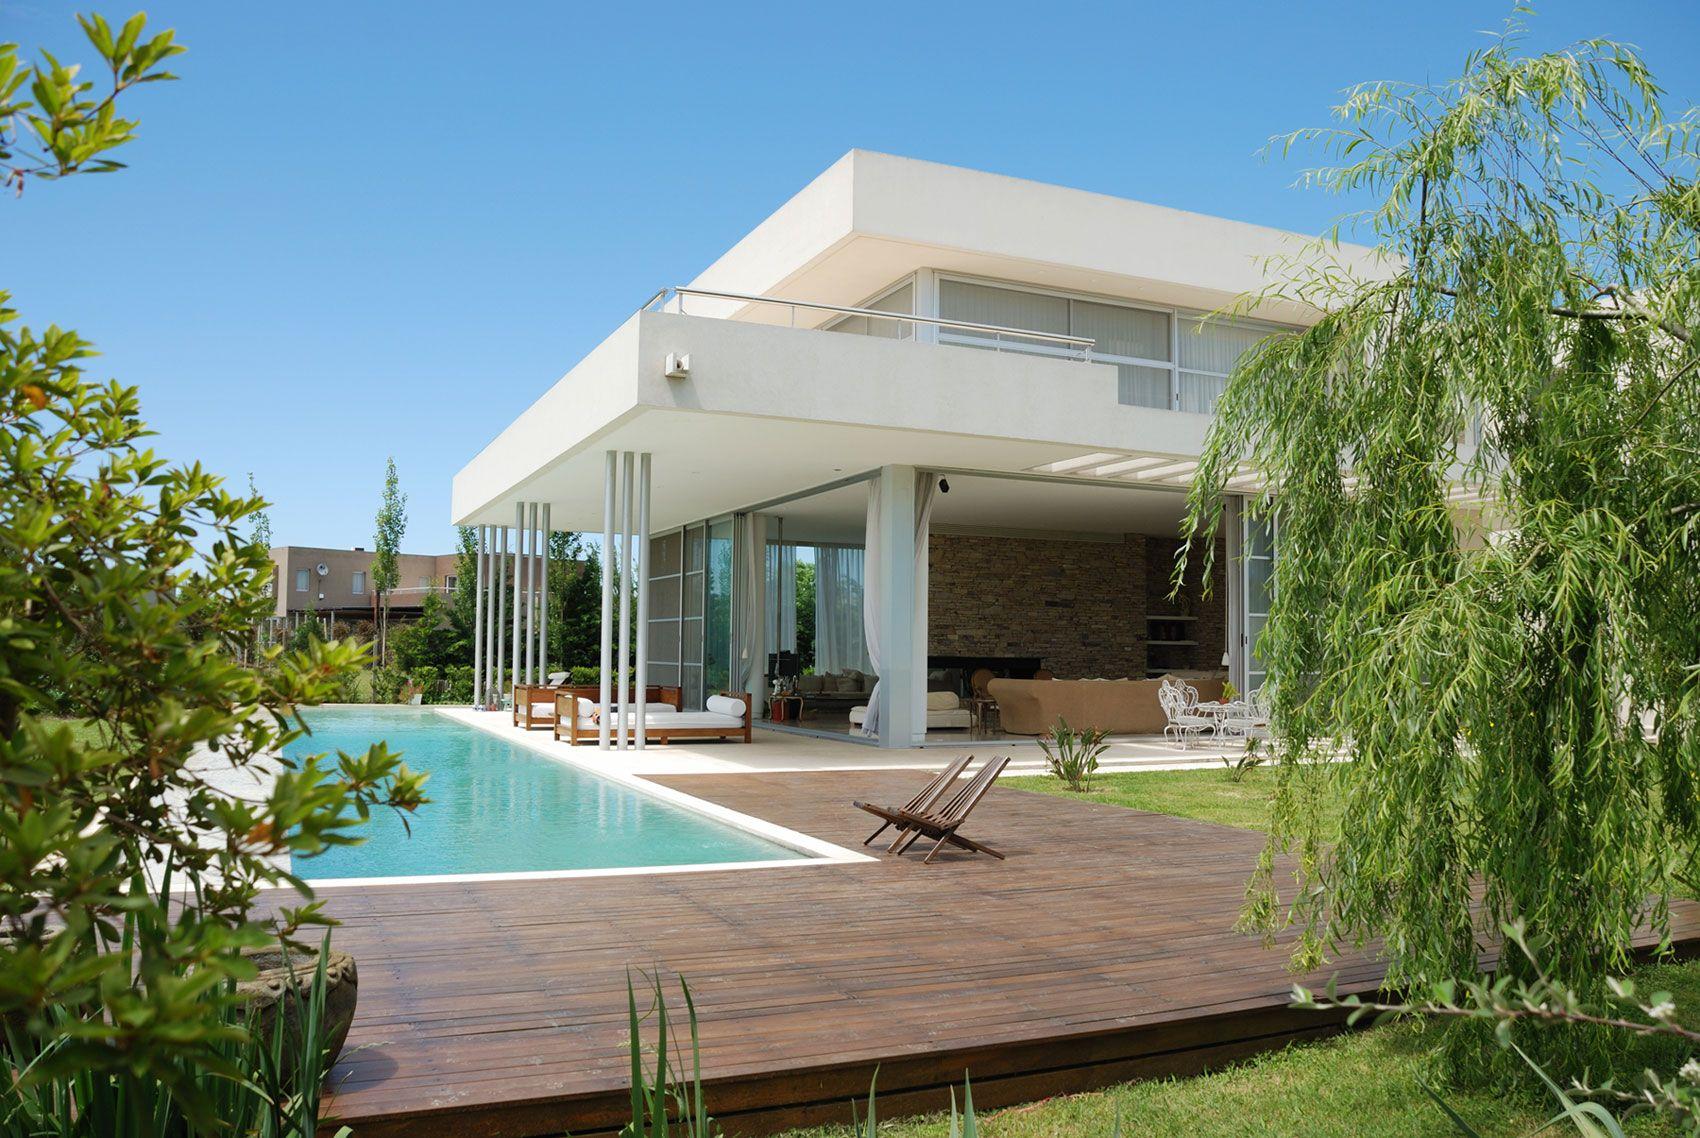 Sheer drapes window treatment ideas for the pool housesun room